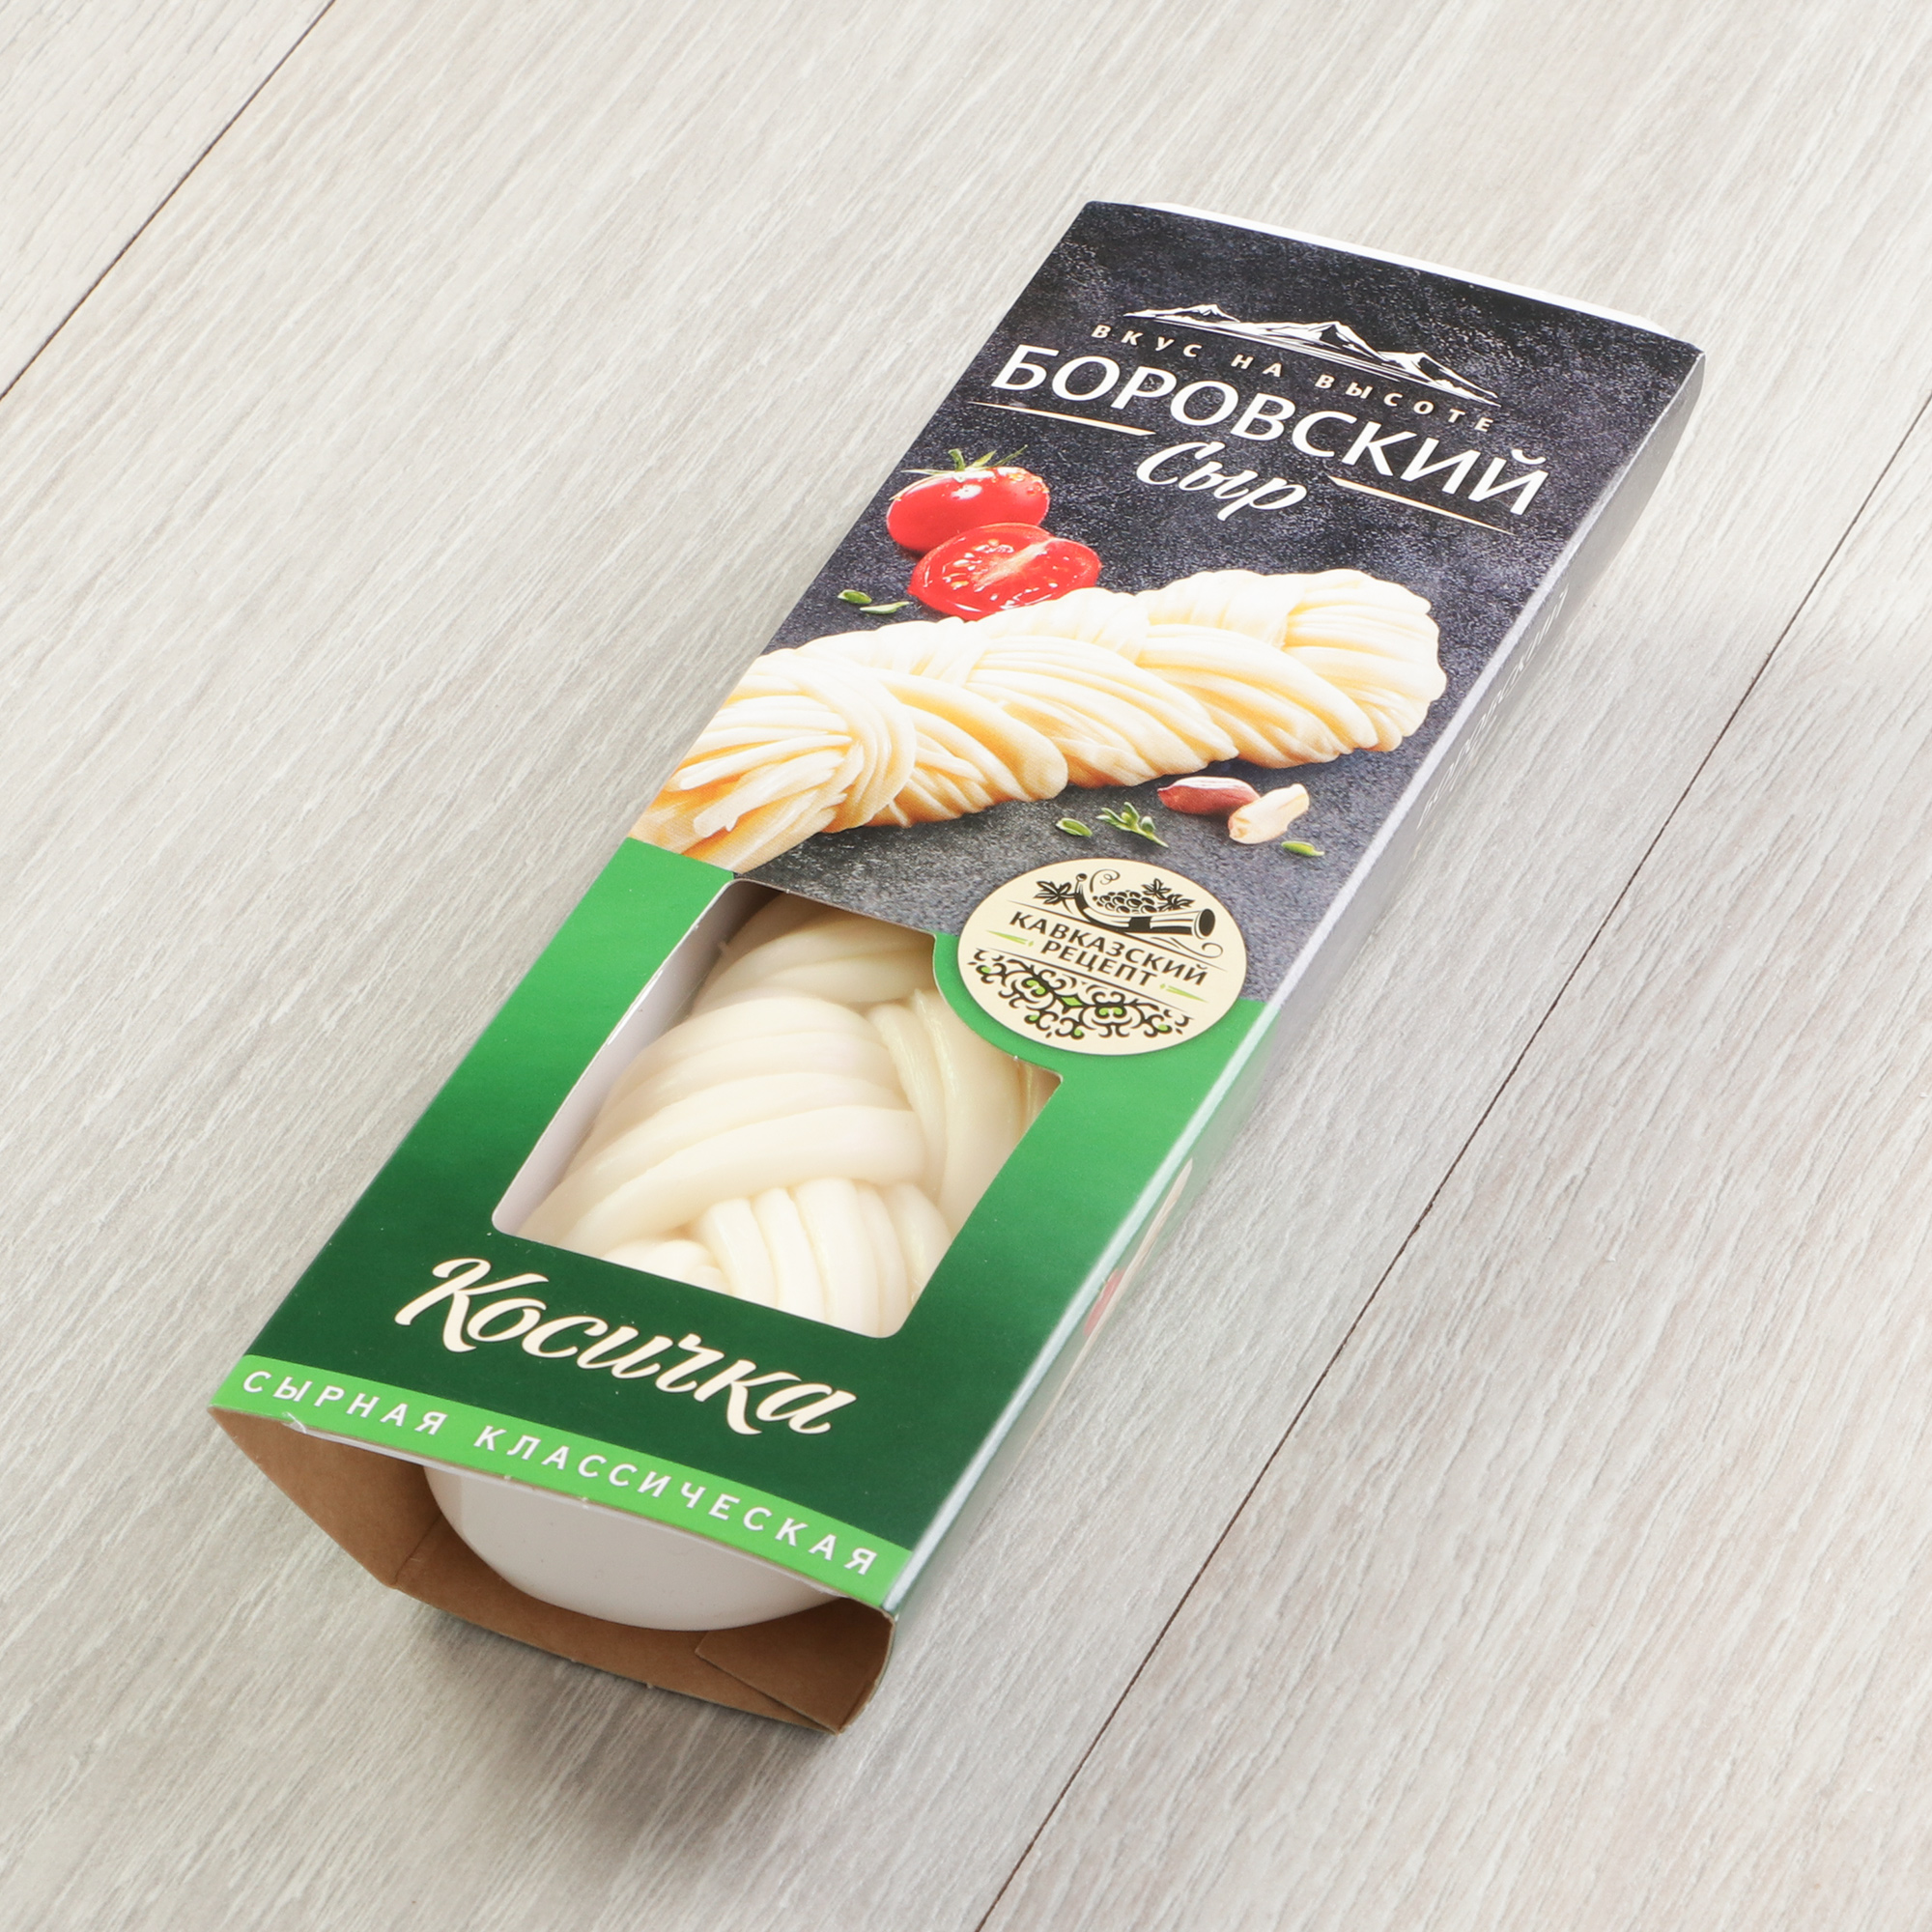 Фото - Косичка сырная Боровский сыр 45% 180 г сыр косичка чизолини 40% 140 г